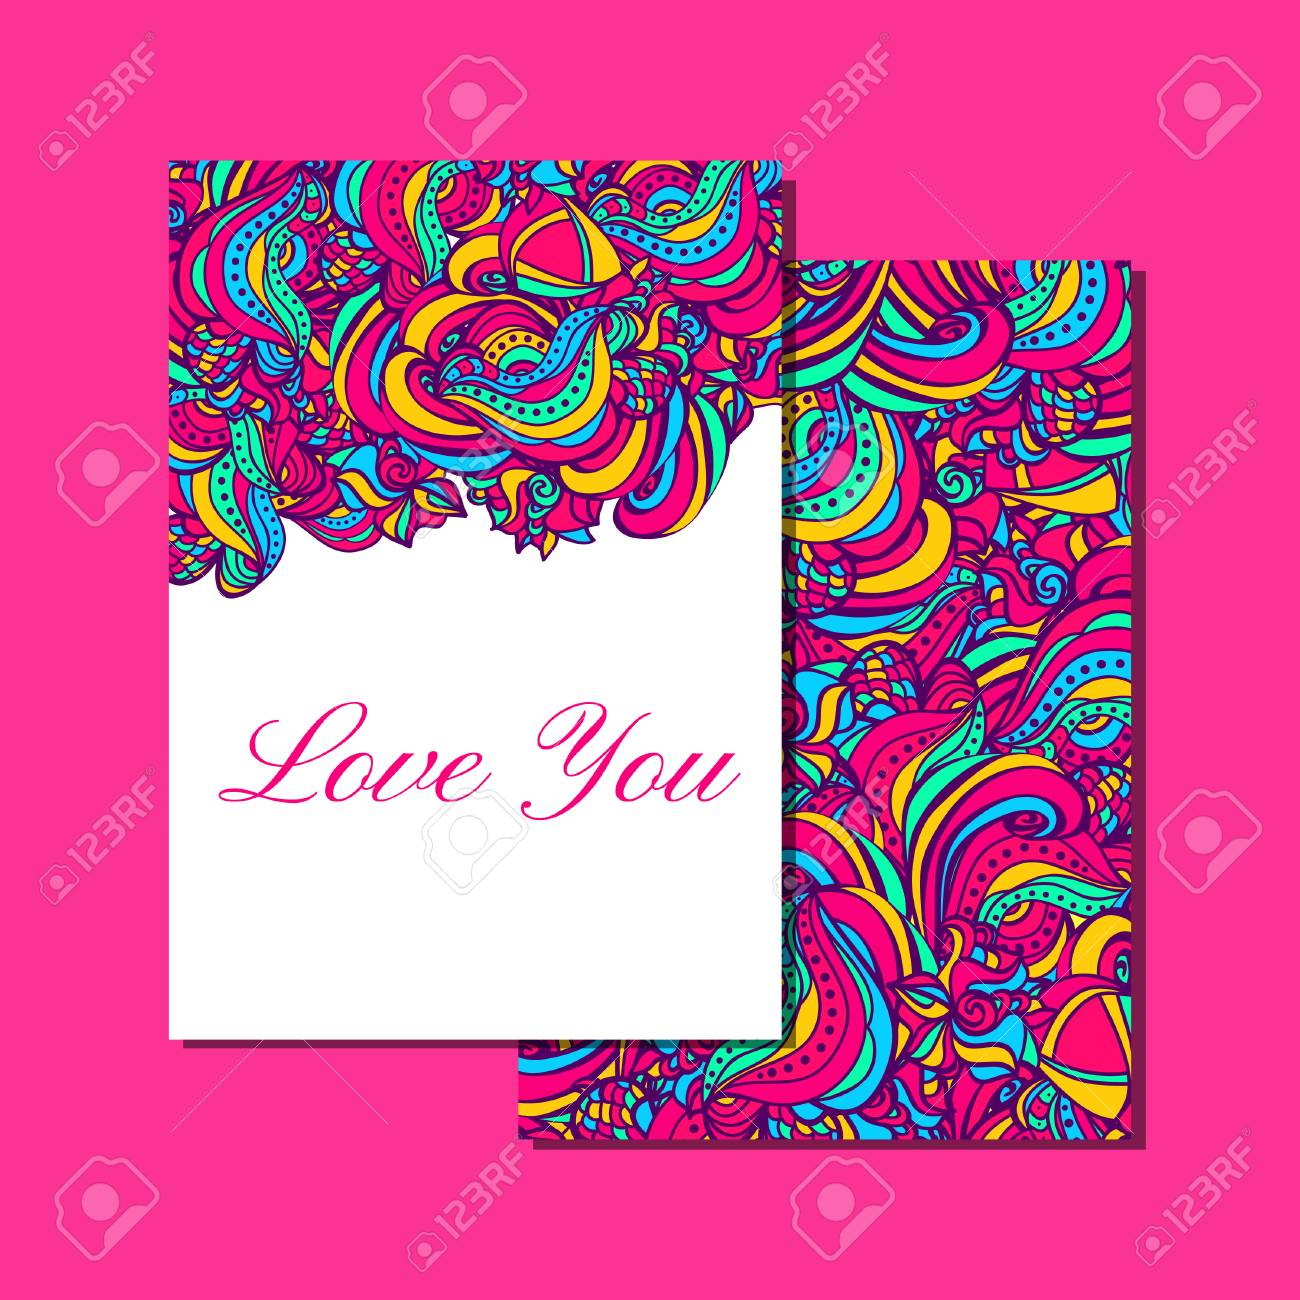 Vivid Invitation Card Bright Colors Easily Editable Template